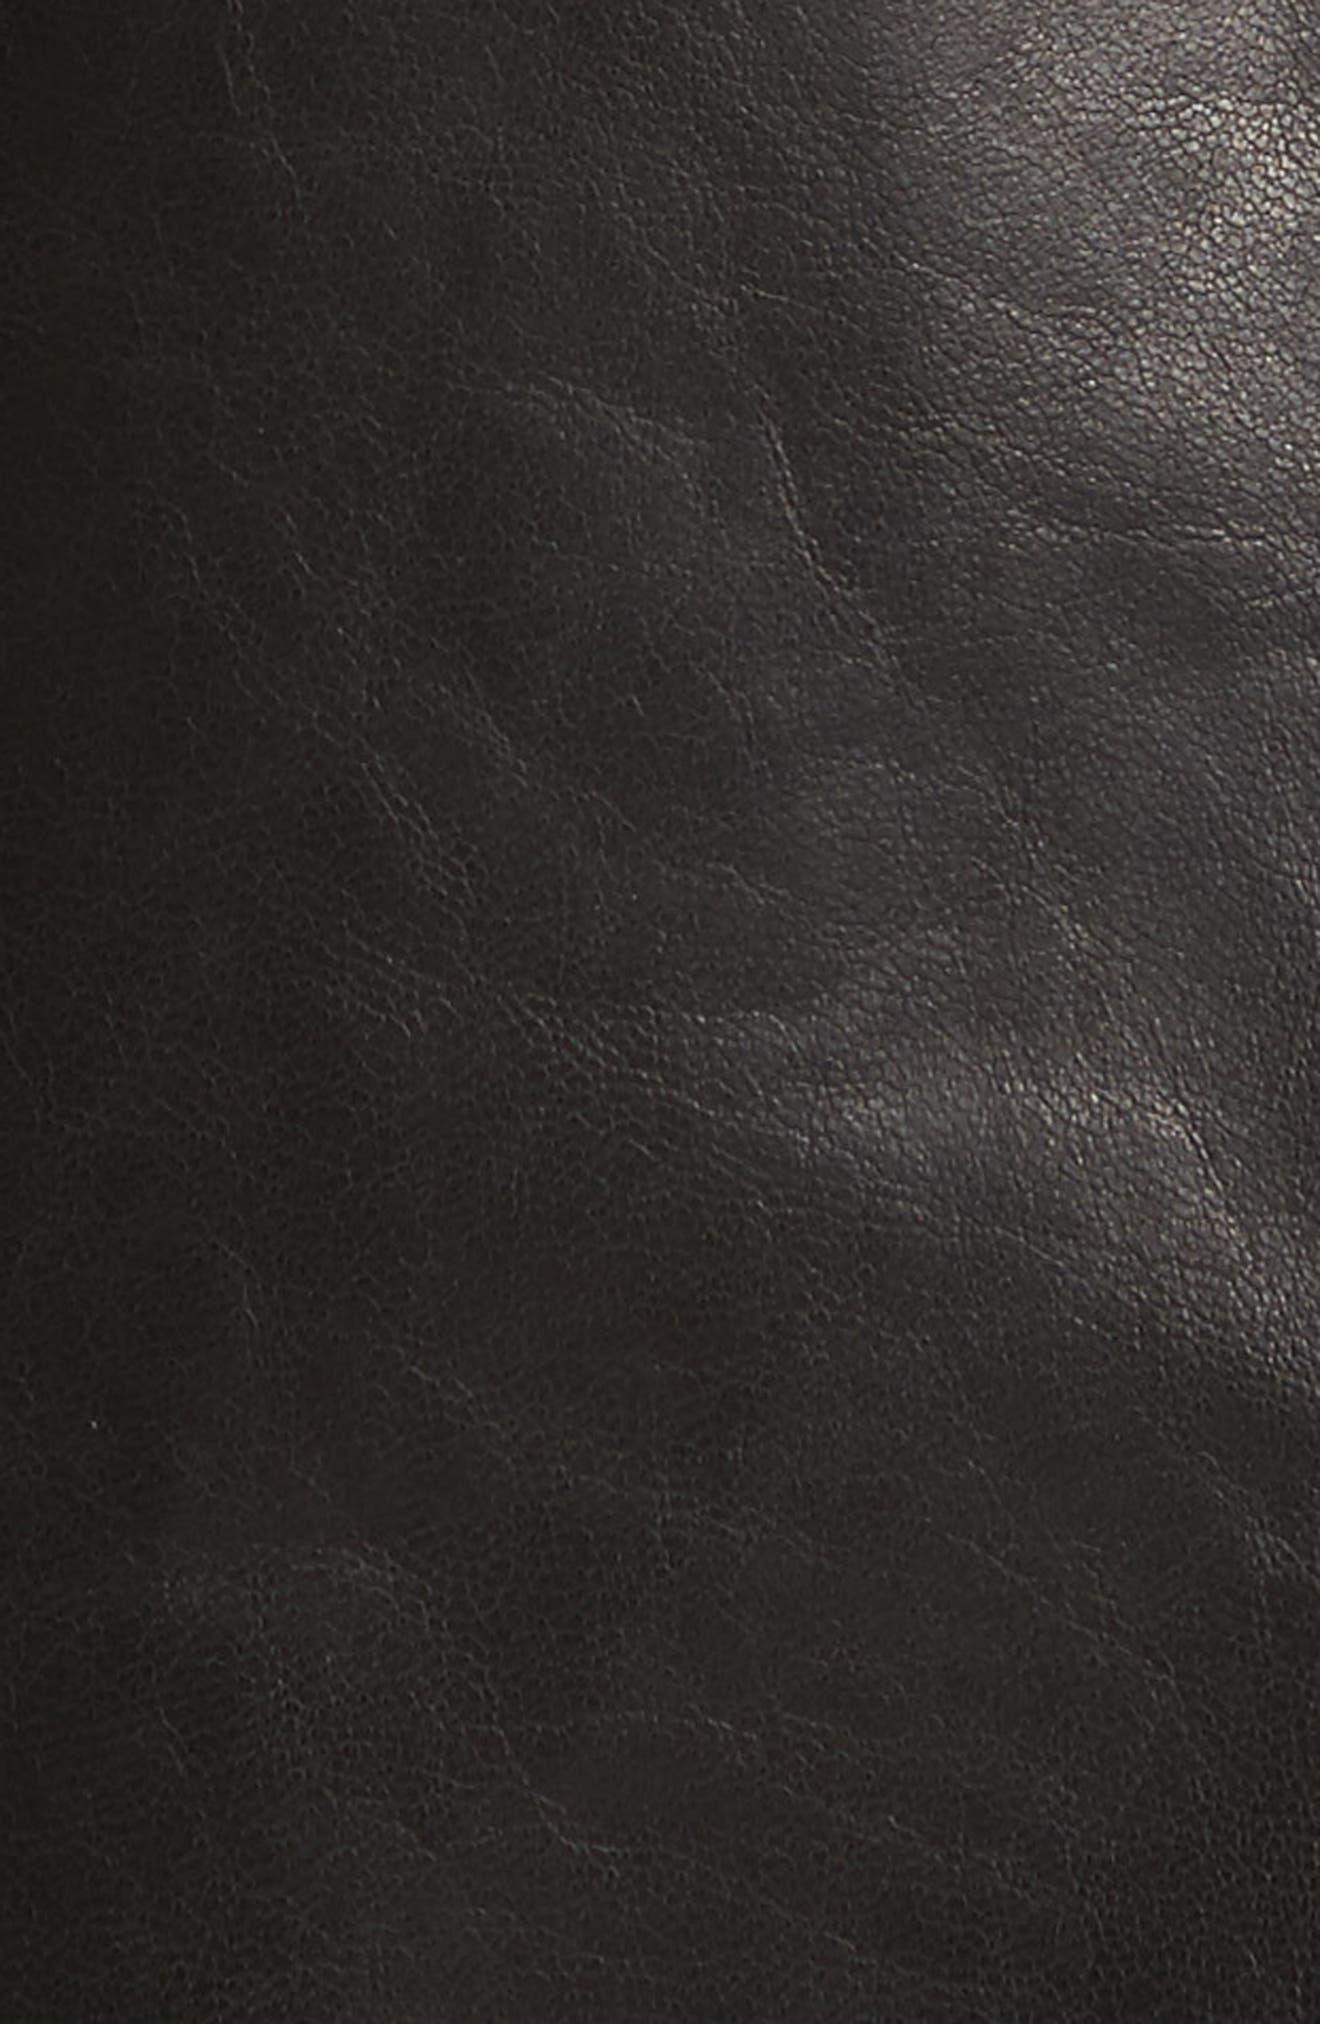 Caridee Glazed Lambskin Leather Jacket,                             Alternate thumbnail 6, color,                             001